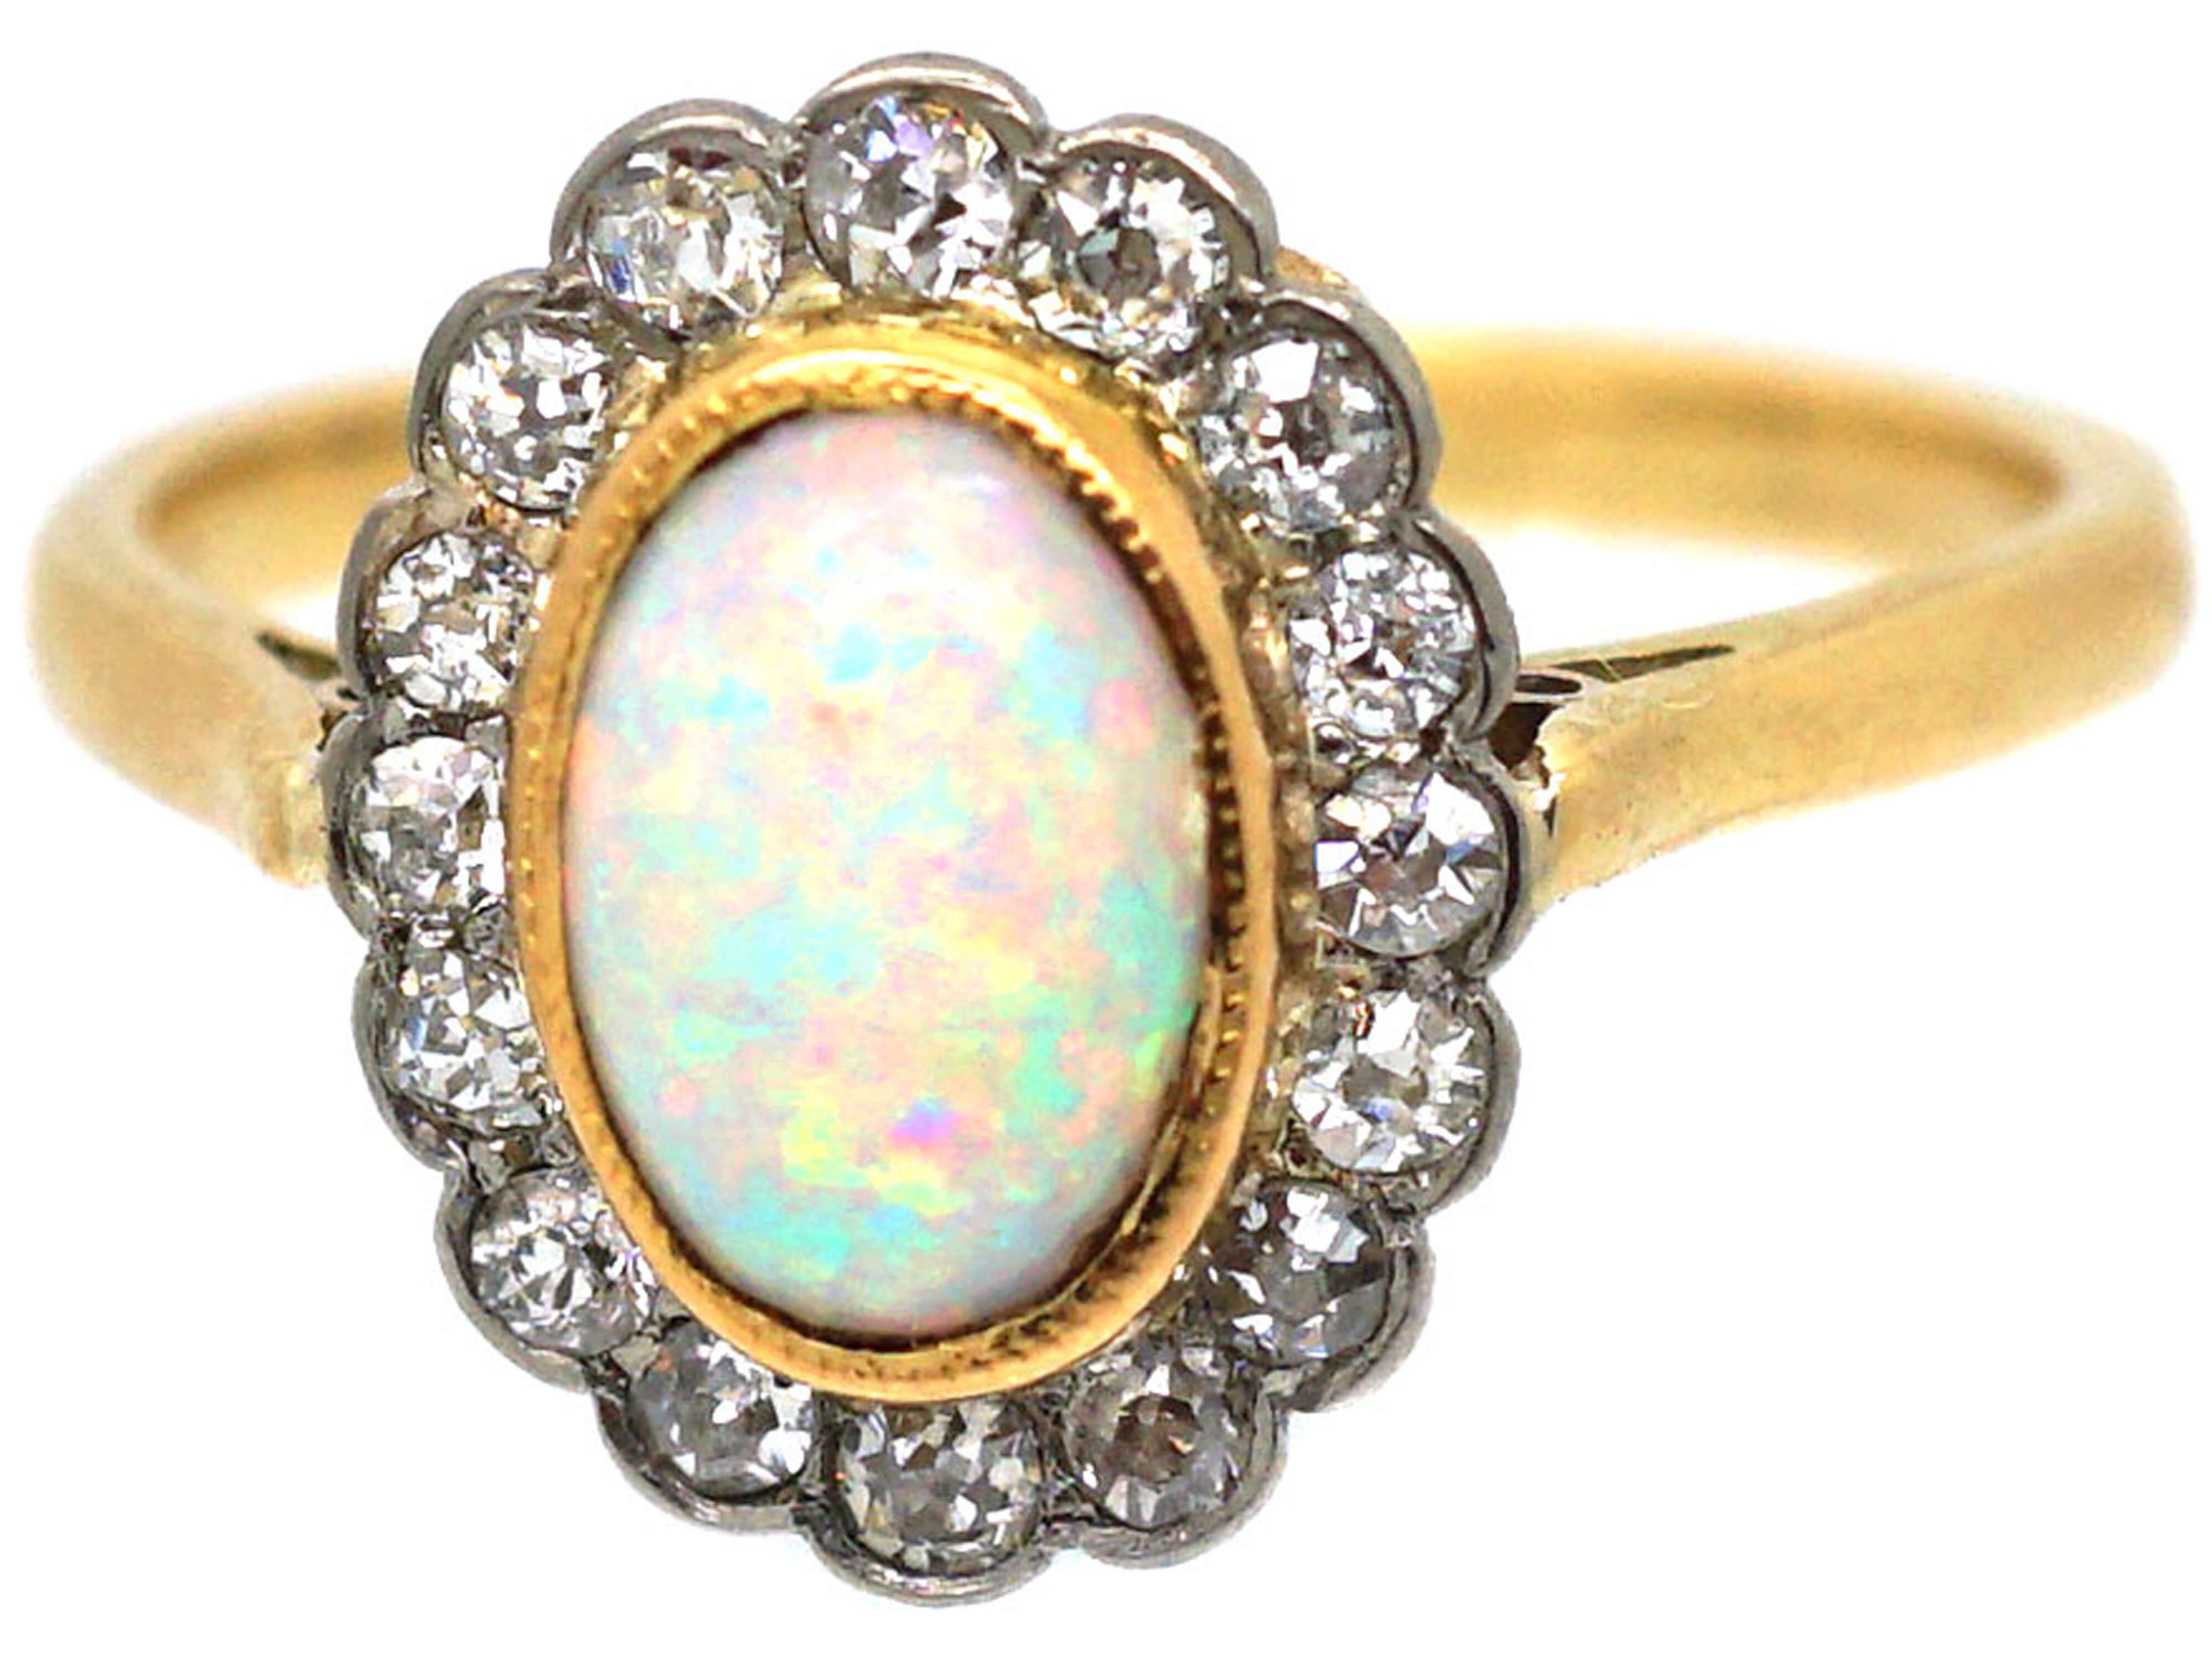 Edwardian 18ct Gold & Platinum, Opal & Diamond Cluster Ring